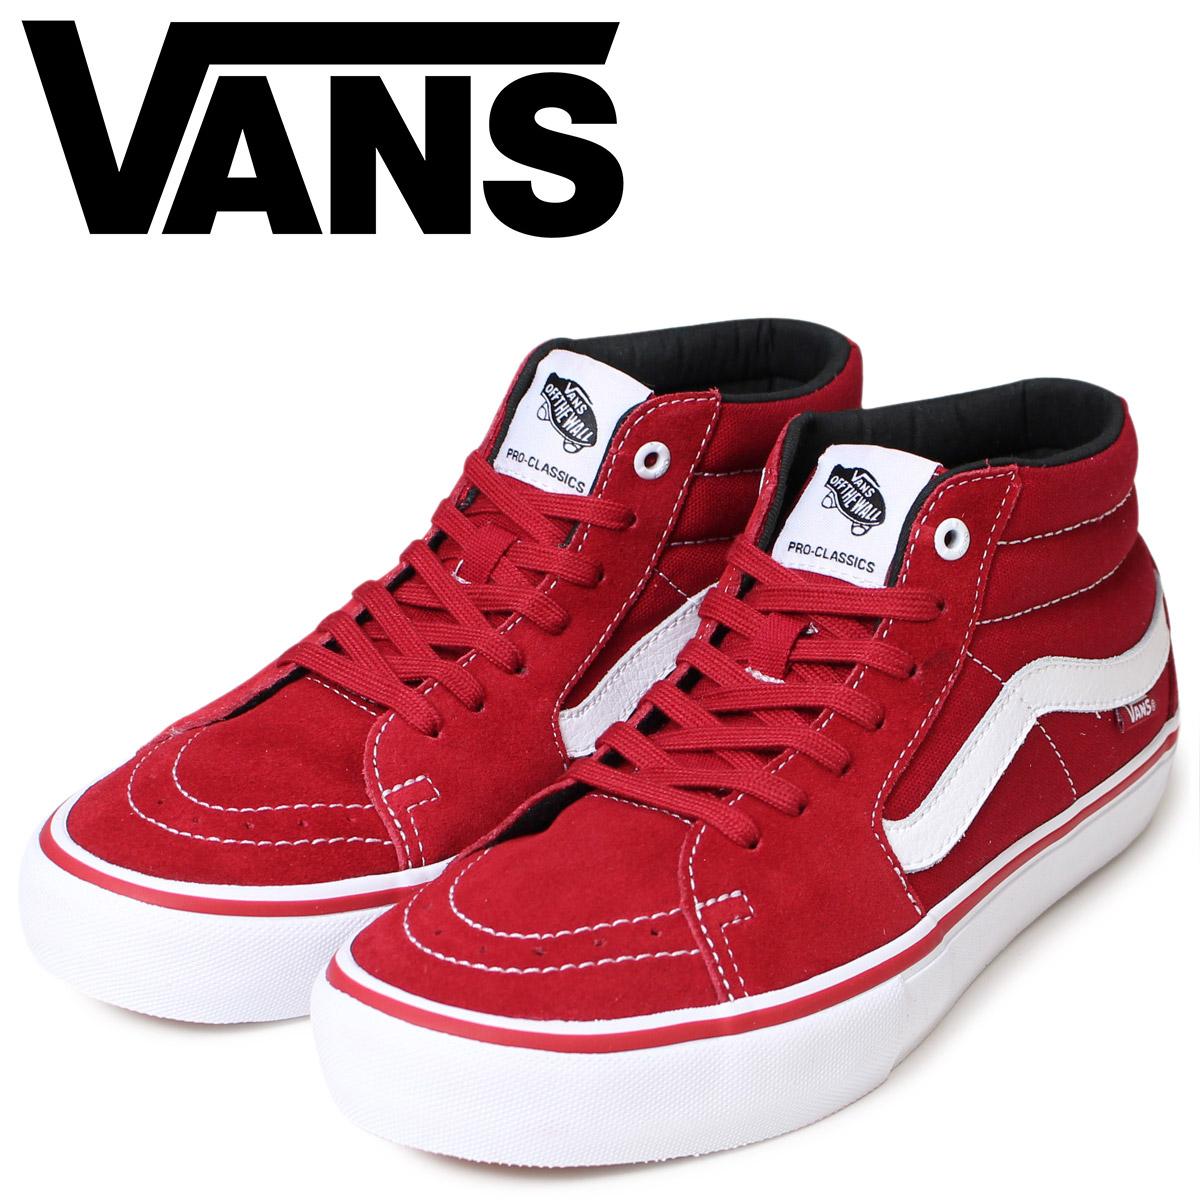 2f8174e77b VANS skating vans men sneakers station wagons SK8 MID PRO VN0A347UFRV shoes  red  2 9 Shinnyu load